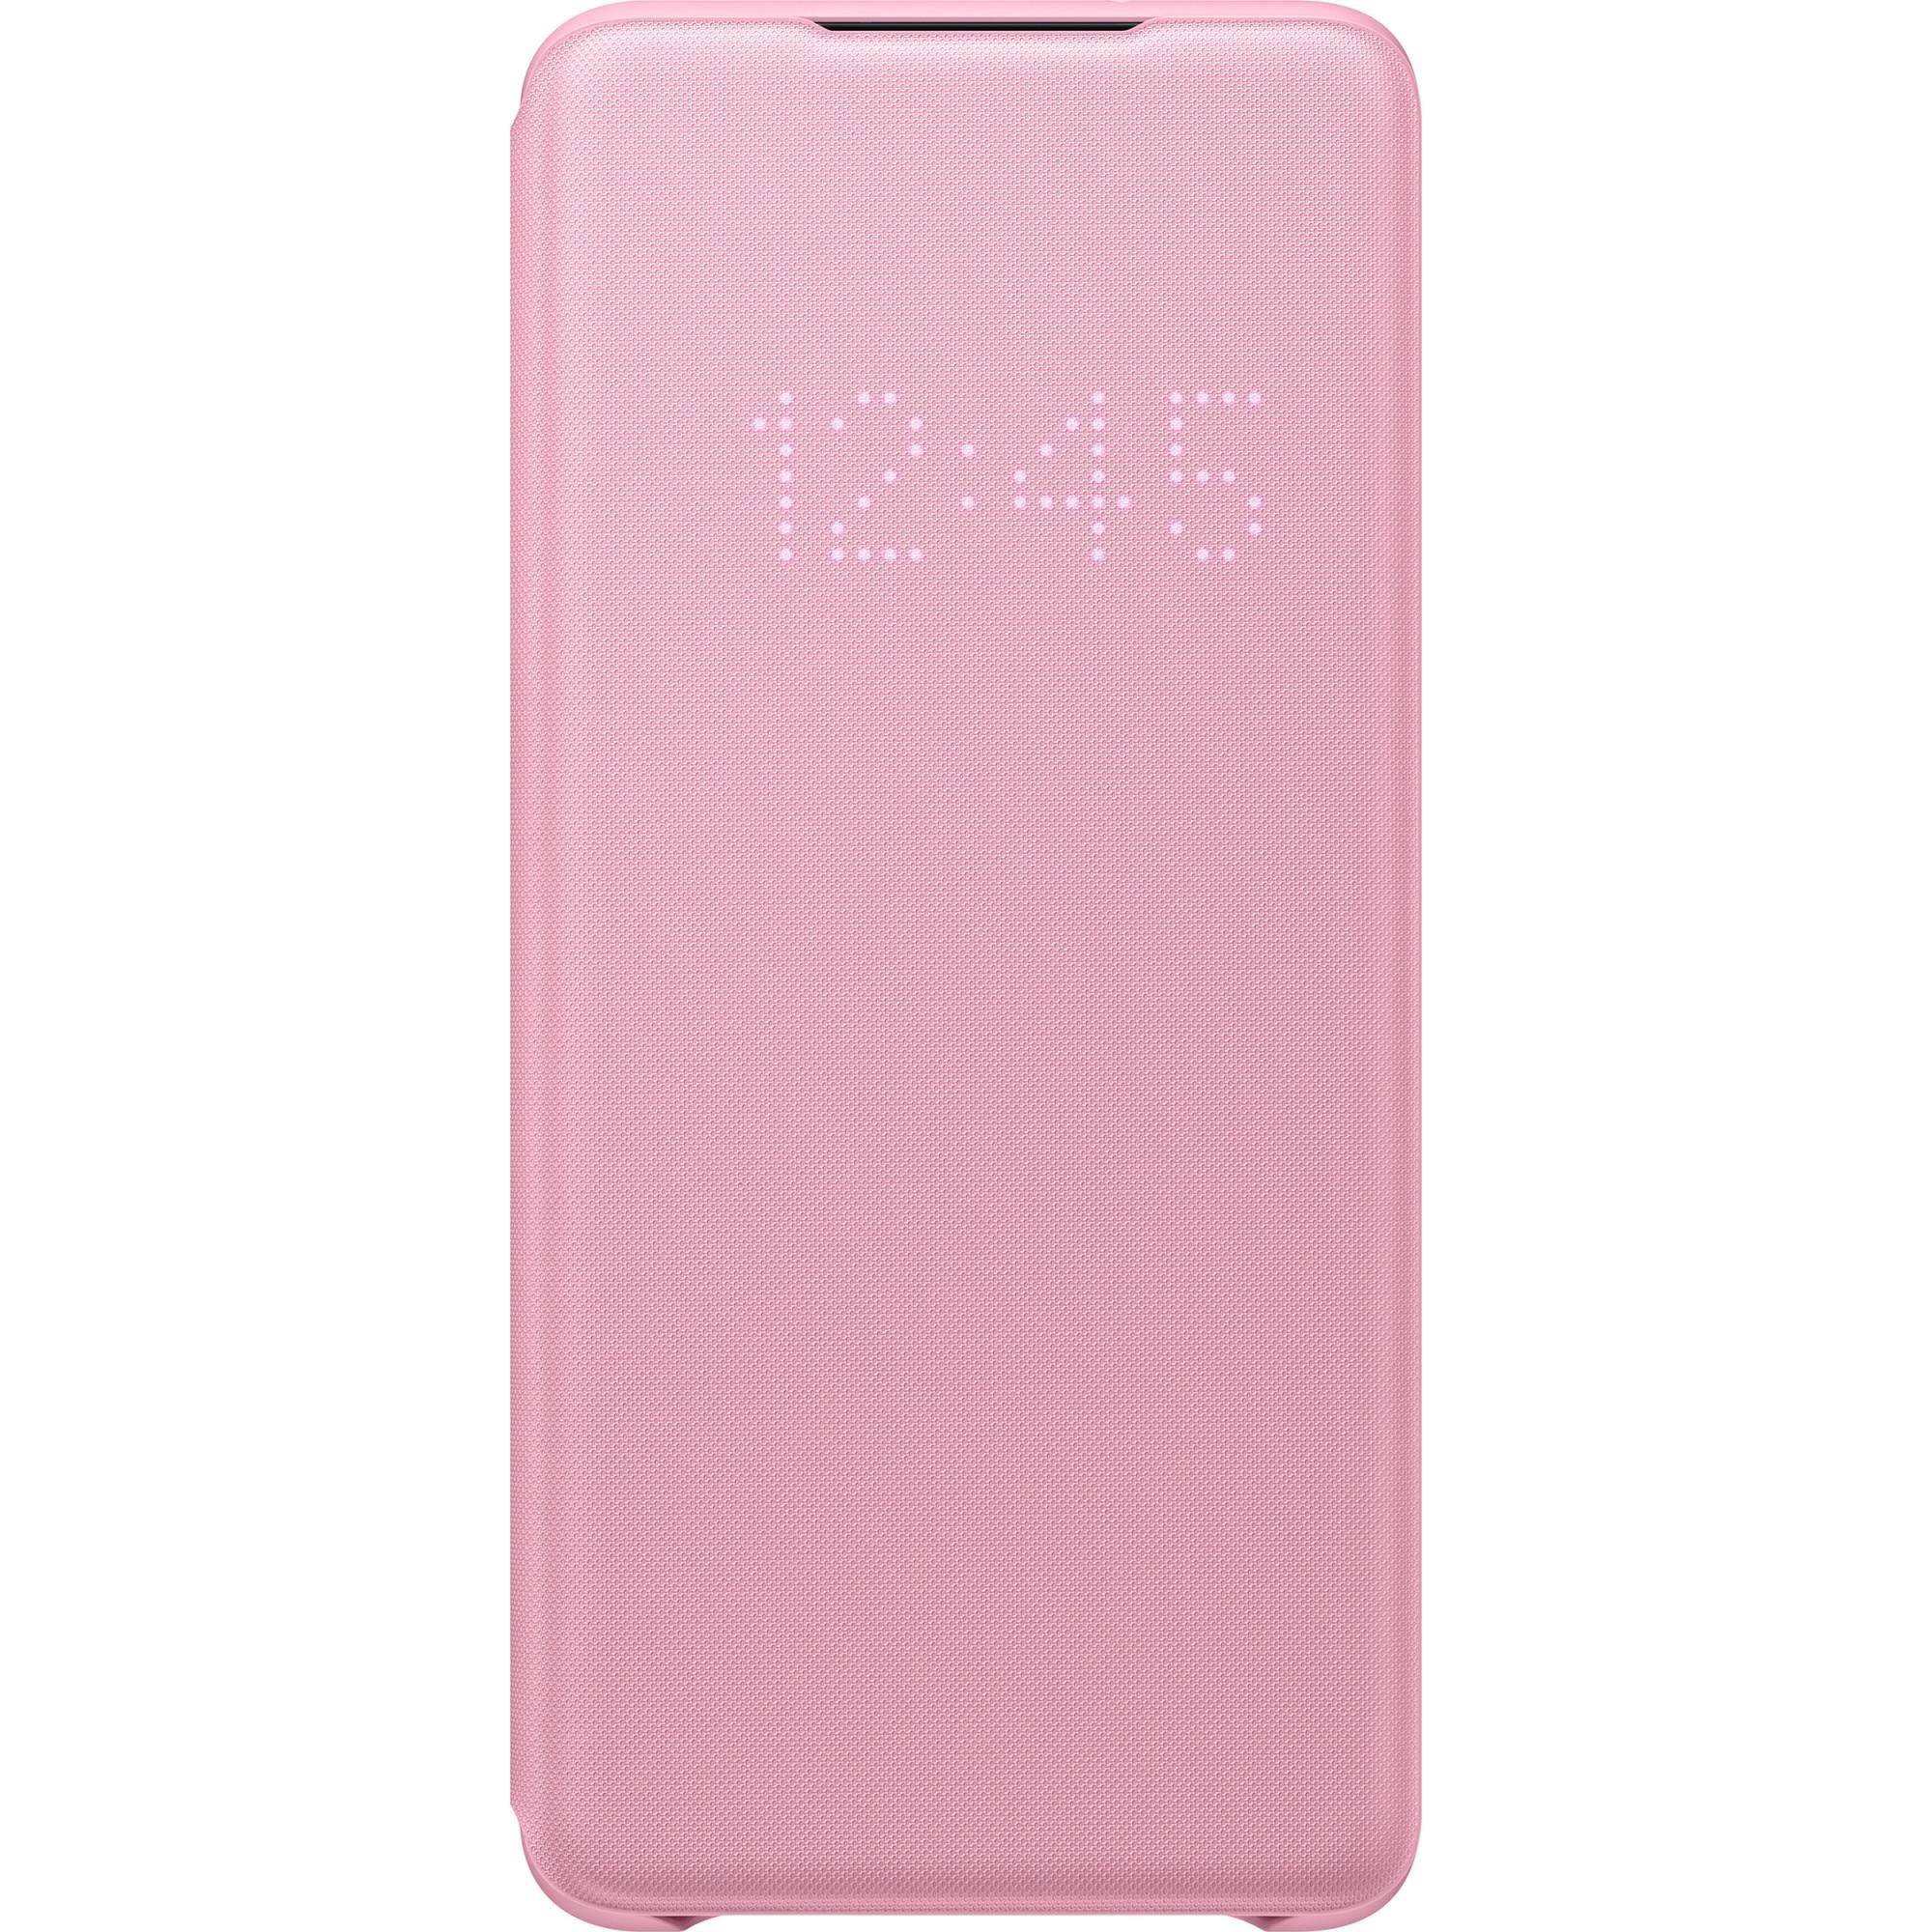 Fotografie Husa de protectie Samsung LED View Cover pentru Galaxy S20 Plus, Pink